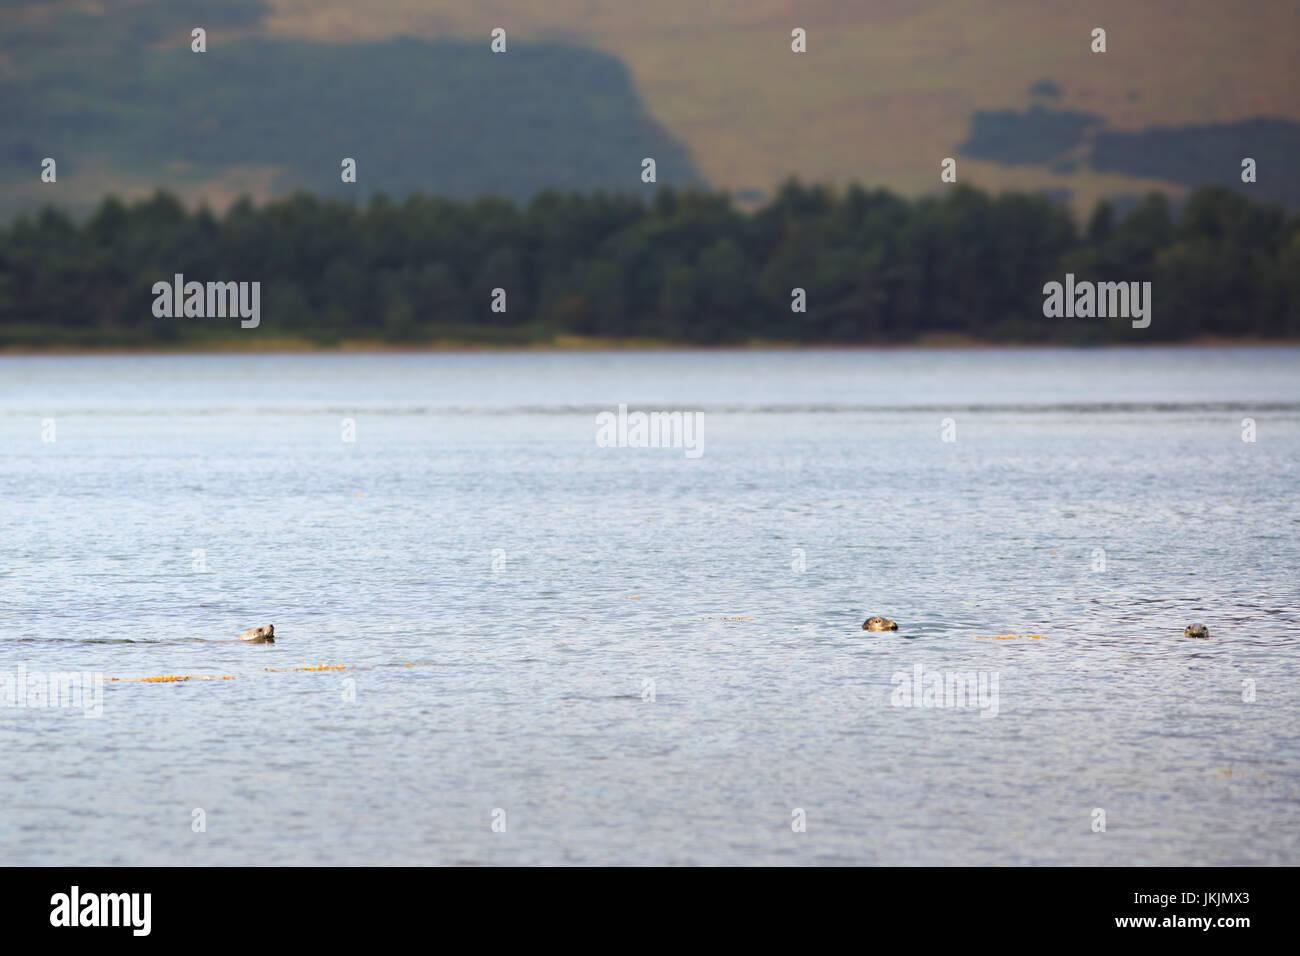 heads of common seals at Loch Fleet, Dornoch Firth, Scotland - Stock Image